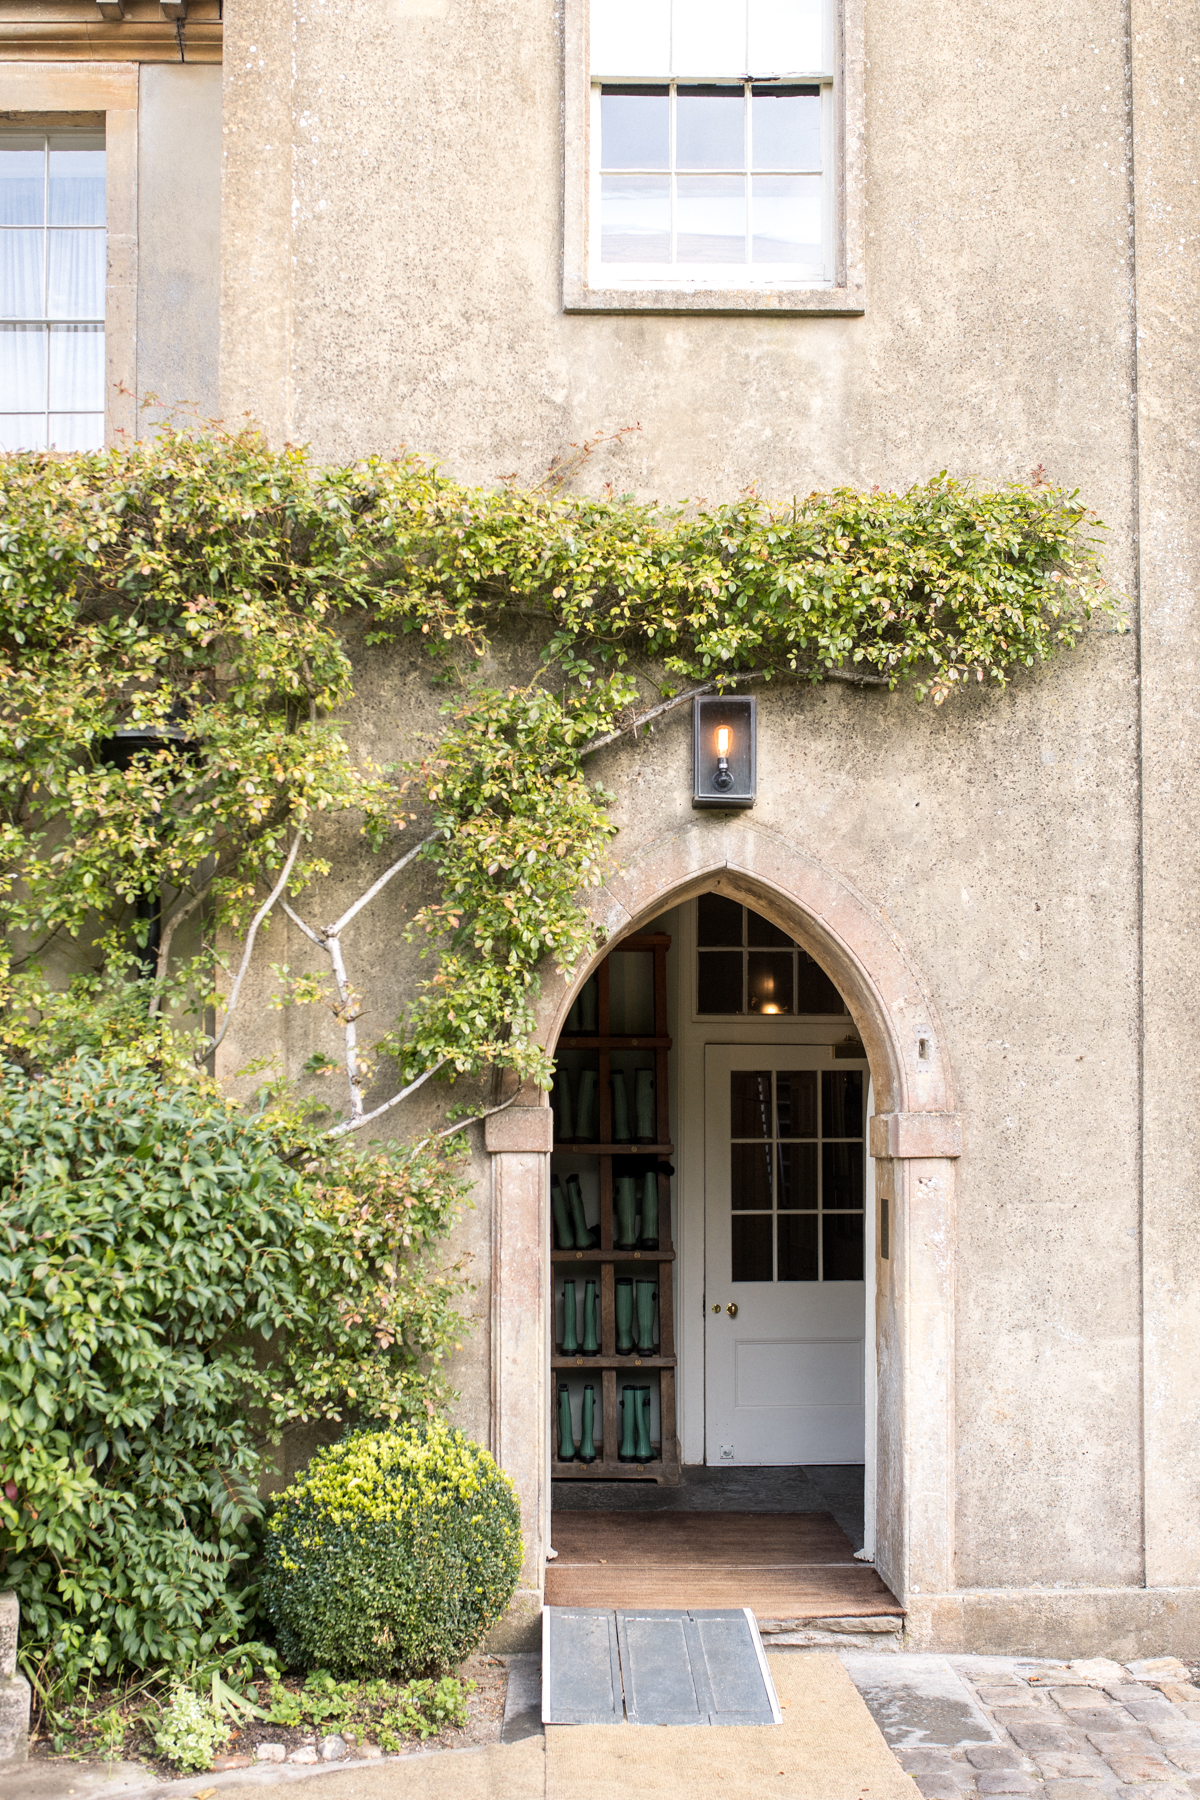 Stacie Flinner Soho House Babington House England-76.jpg